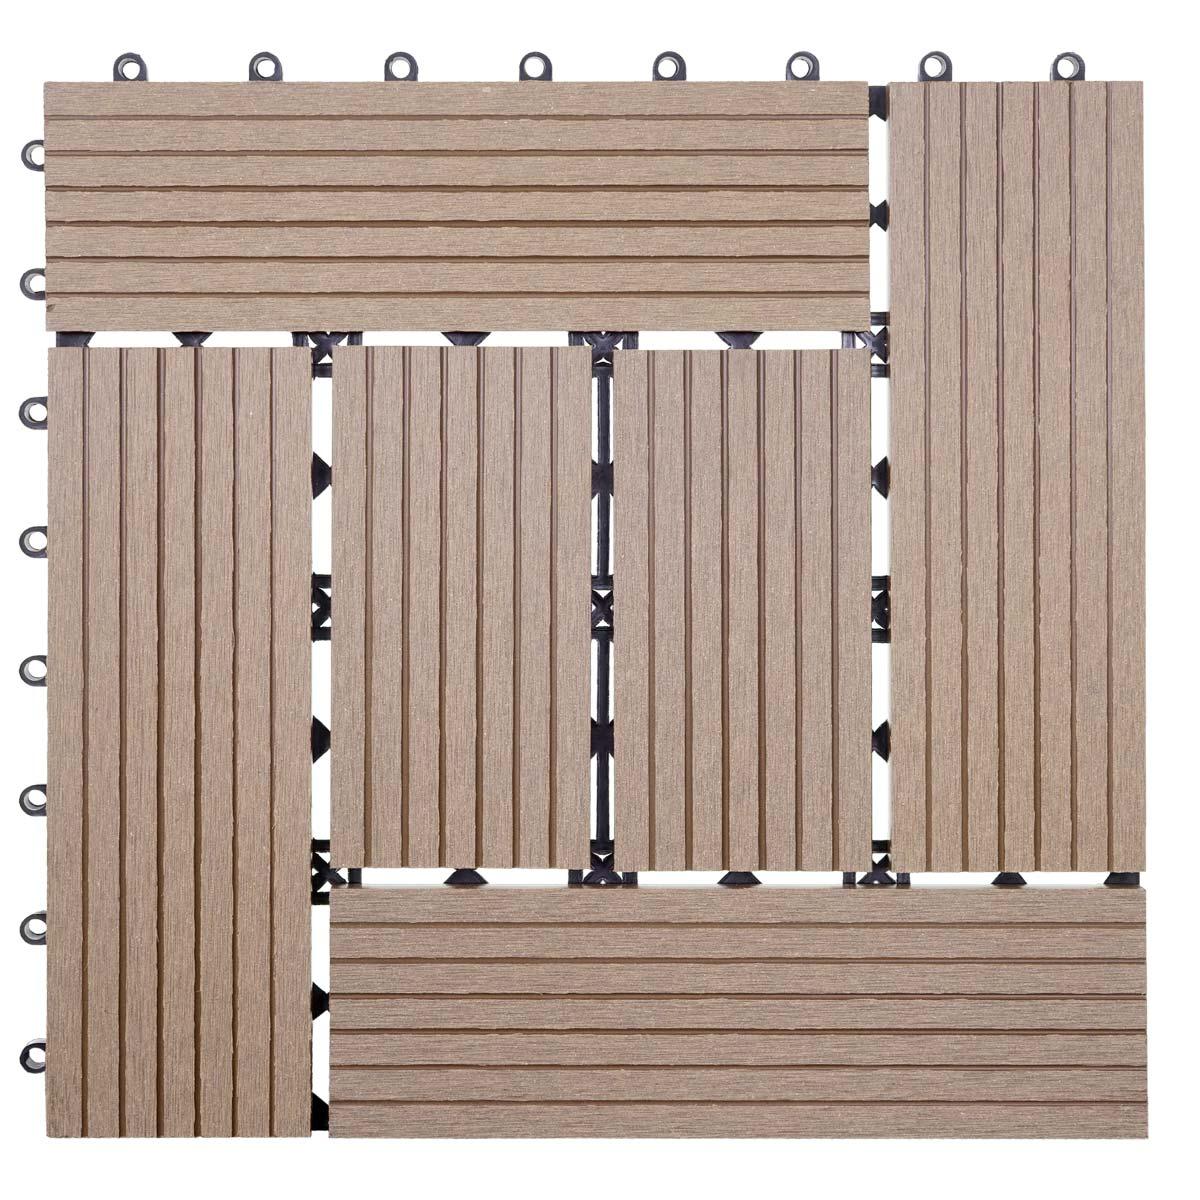 1qm wpc holz fliesen sarthe bodenfliesen balkon terrasse. Black Bedroom Furniture Sets. Home Design Ideas